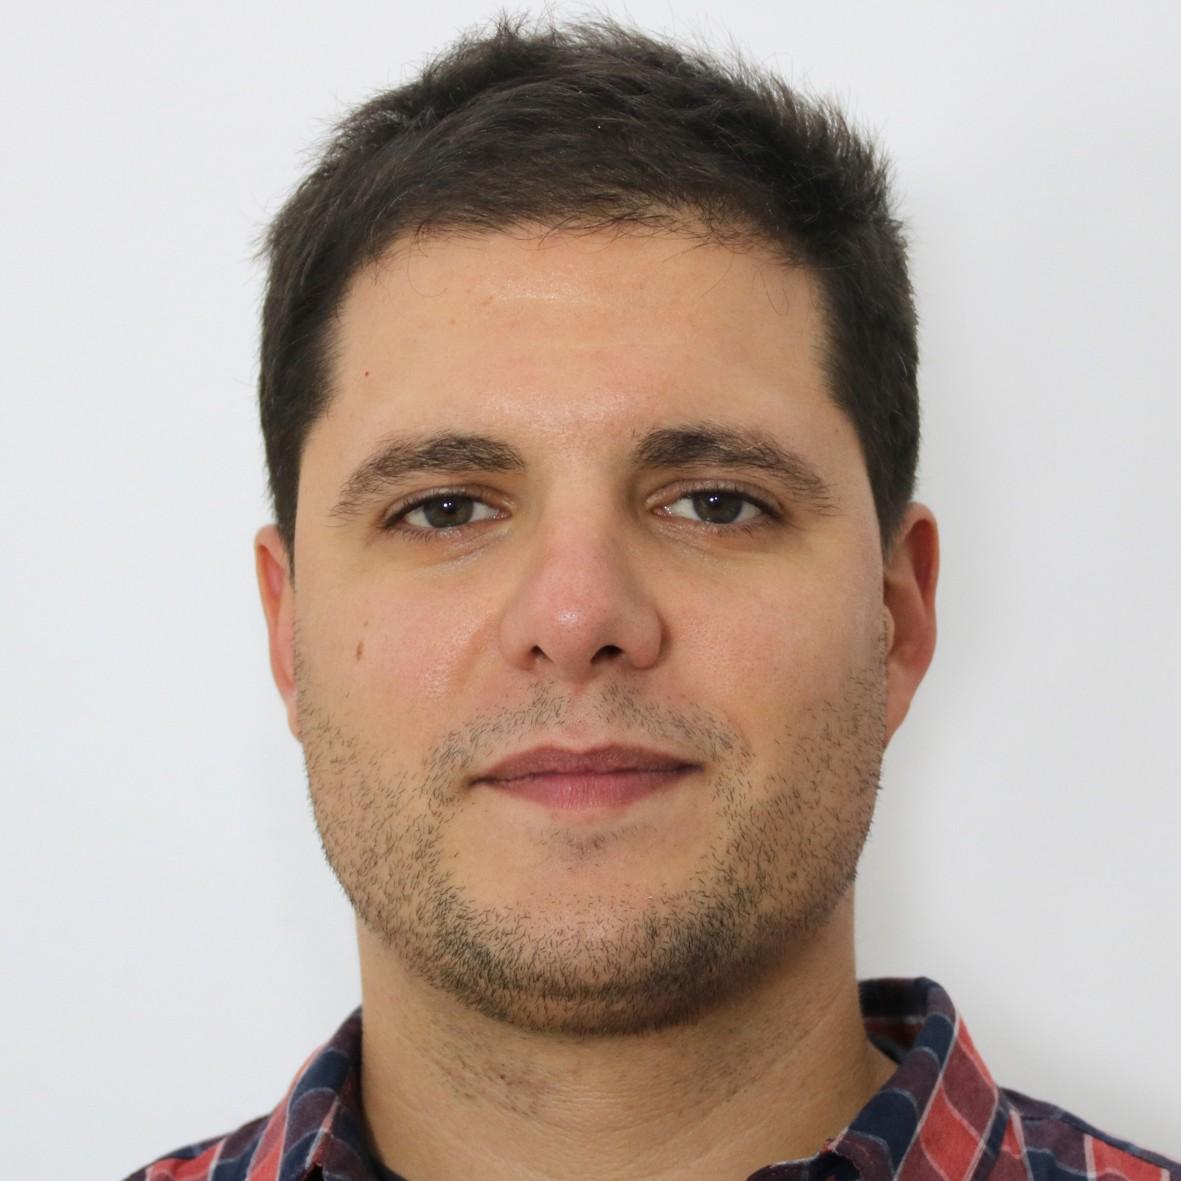 João Salcedas